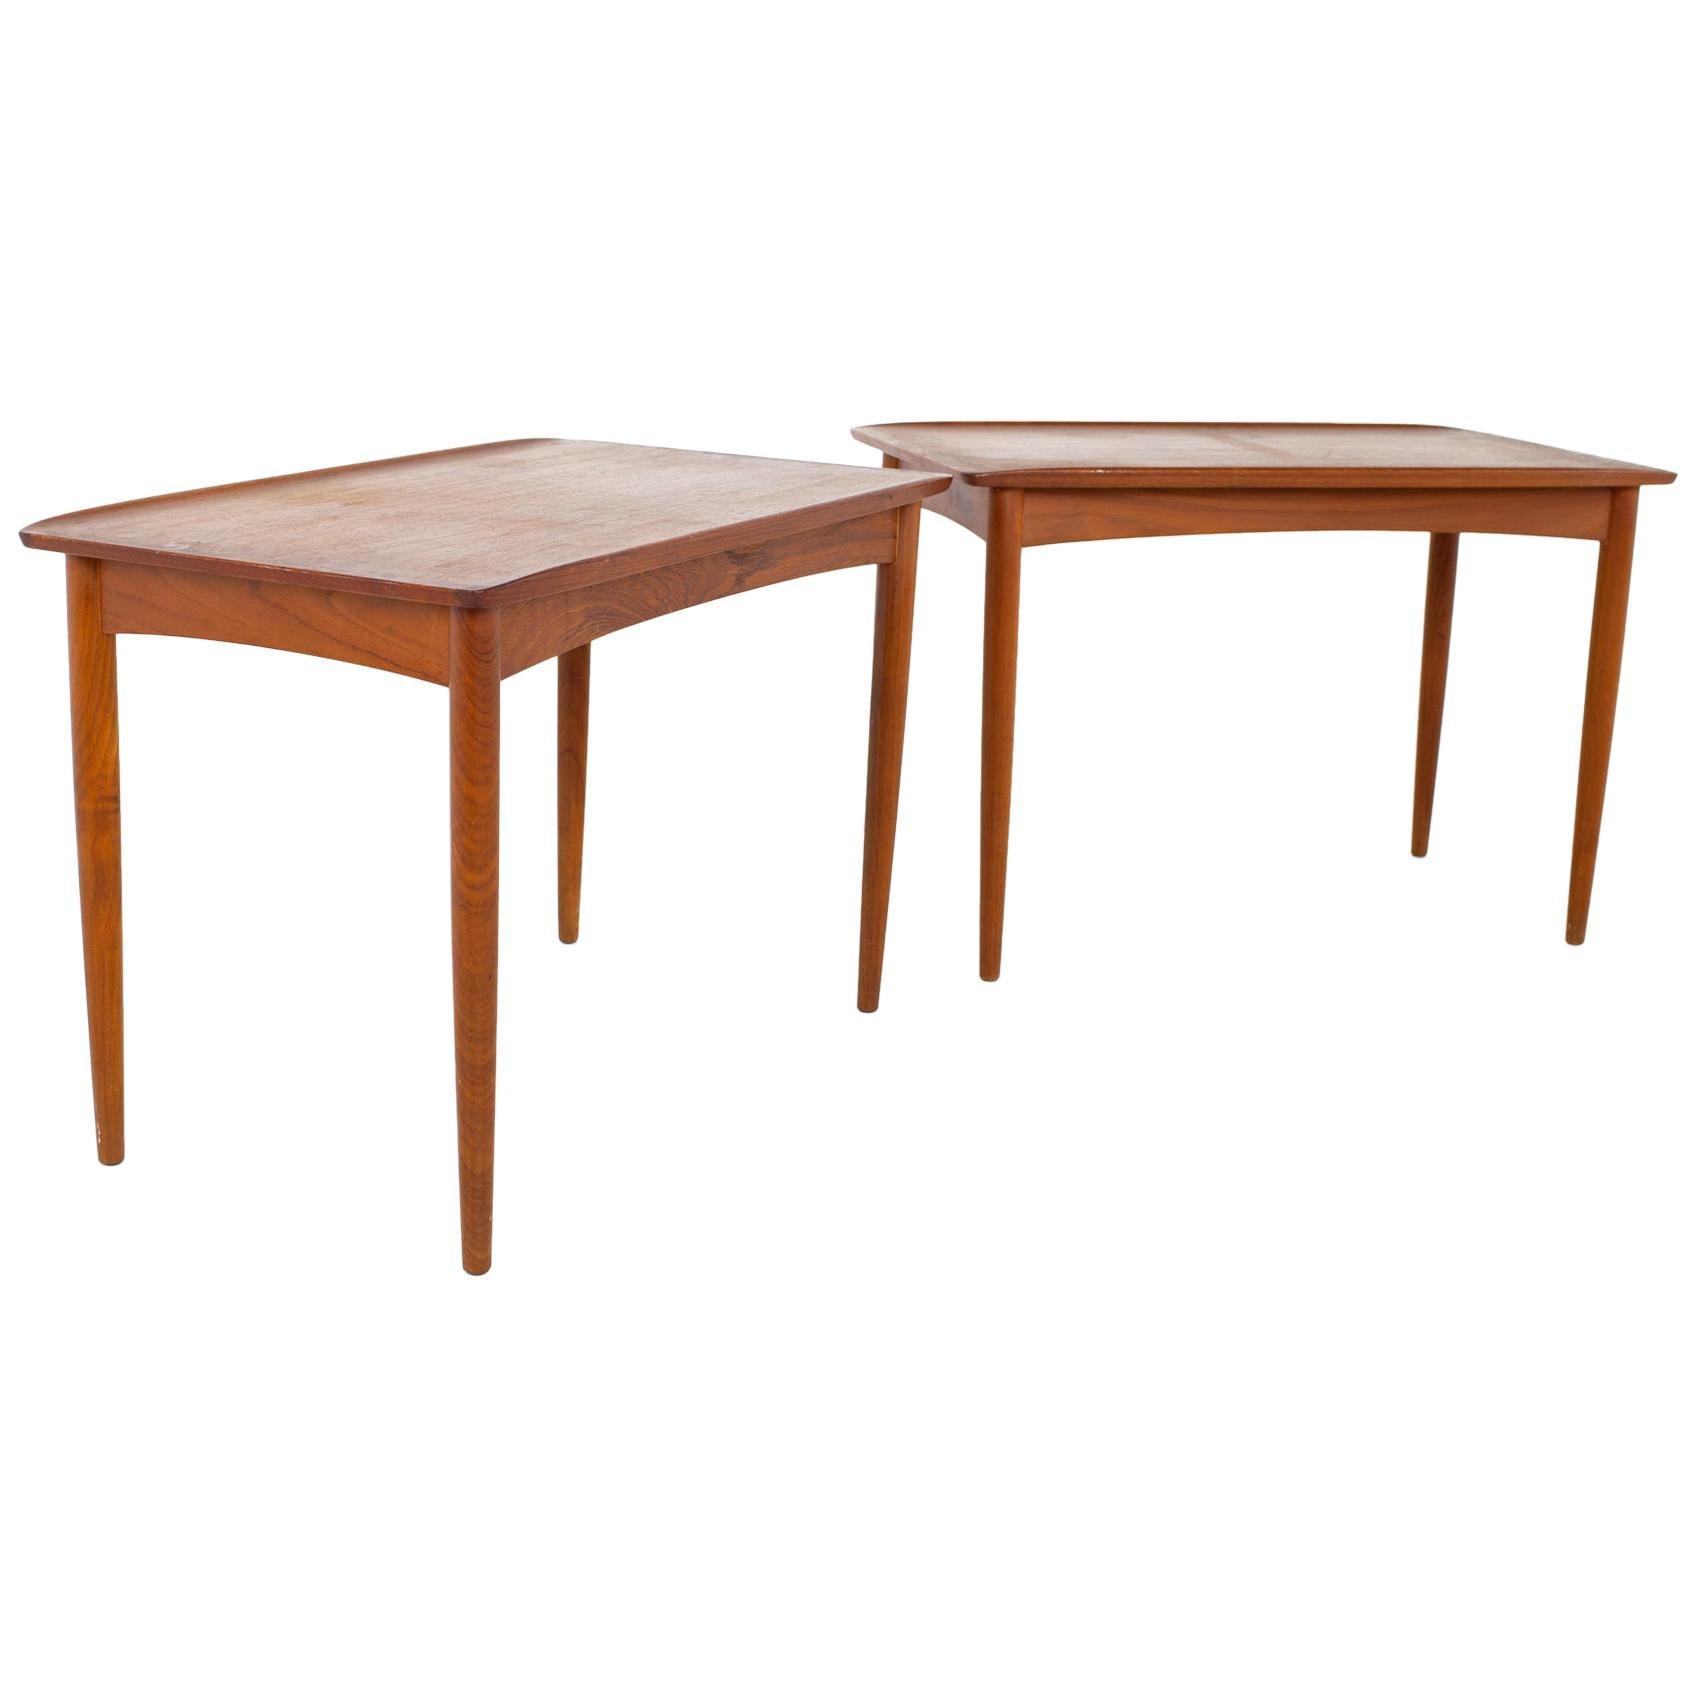 Grete Jalk Style Mid Century Danish Teak Side End Tables, a Pair